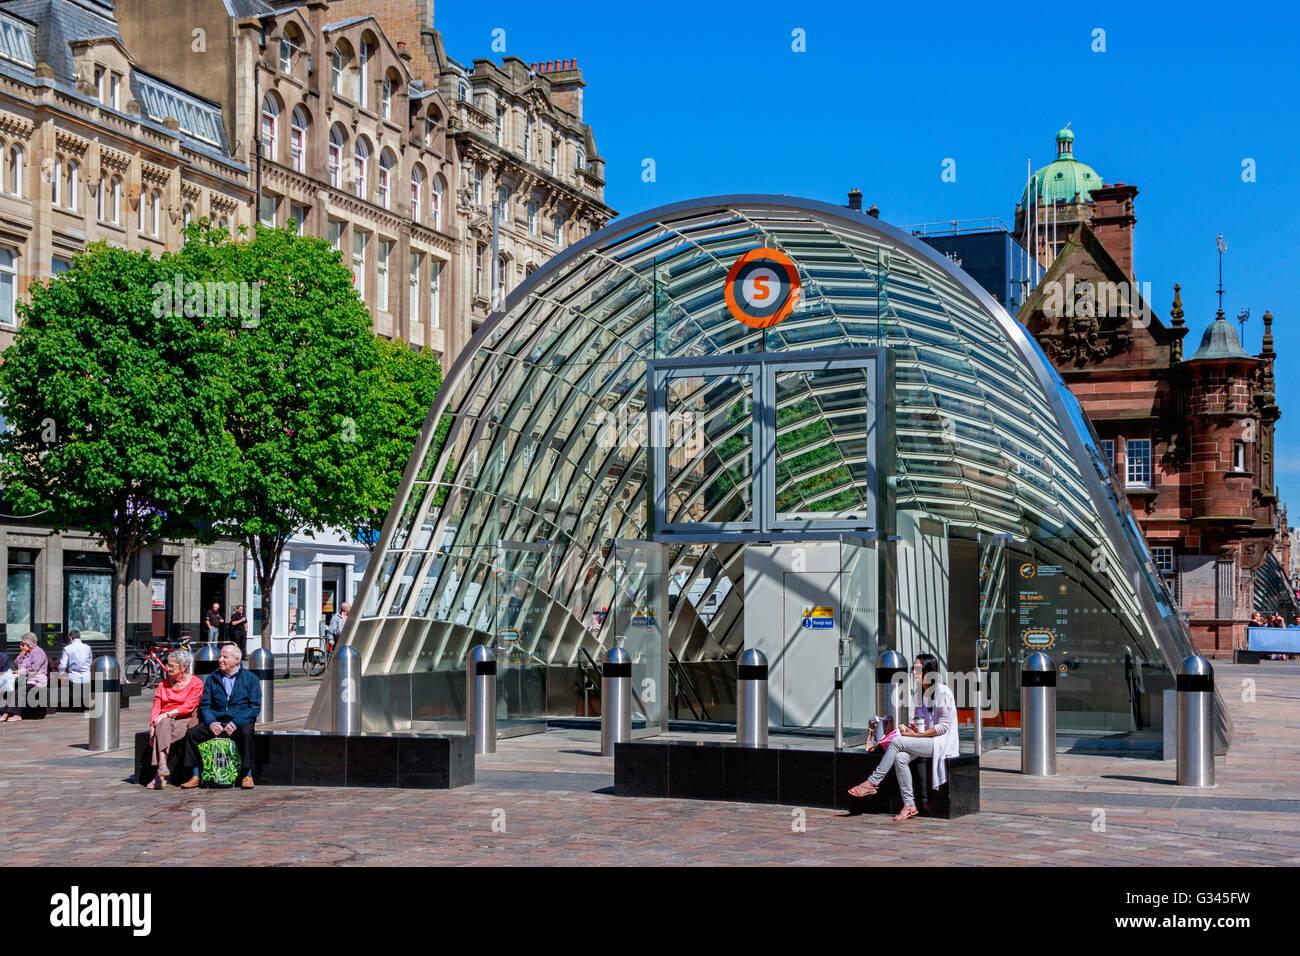 Entrance to St Enochs subway, in St Enochs Square, Glasgow, Scotland, UK - Stock Image